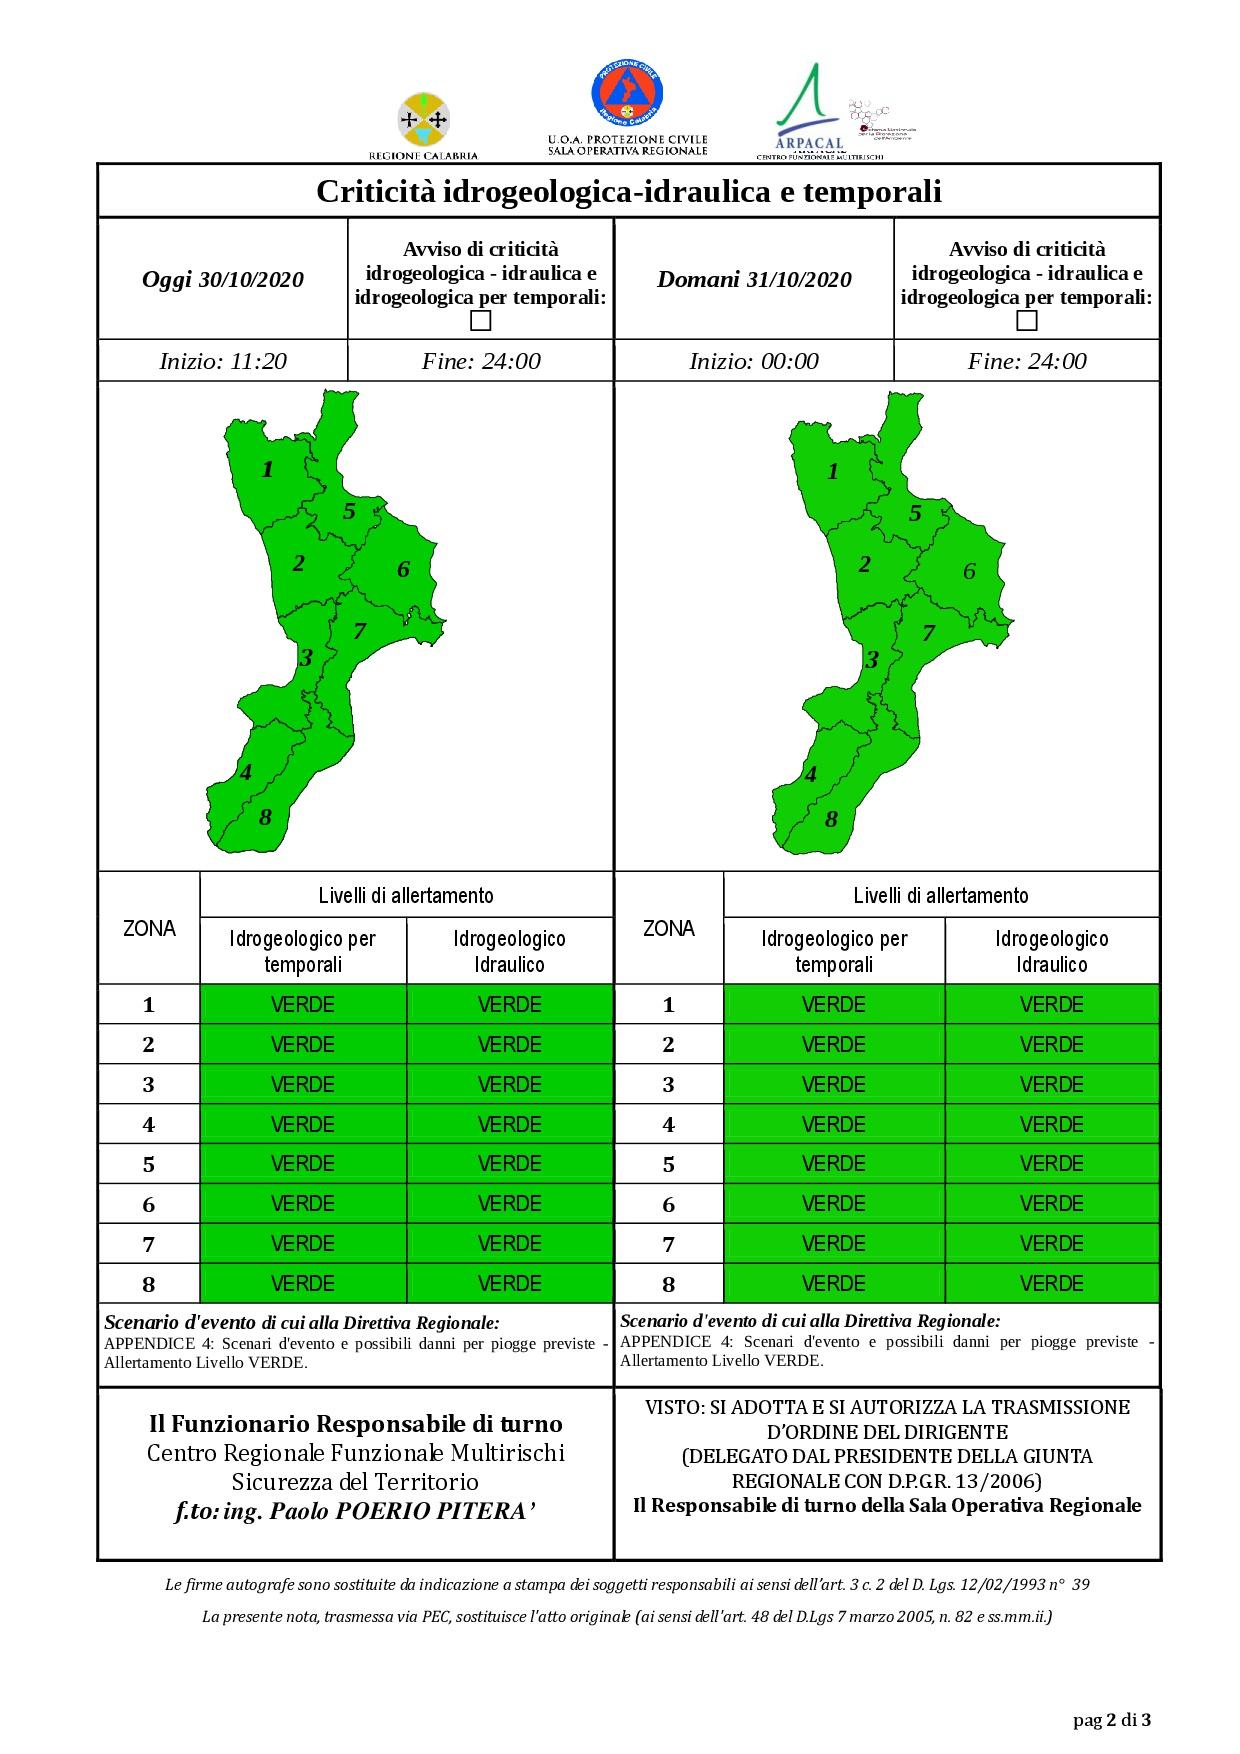 Criticità idrogeologica-idraulica e temporali in Calabria 30-10-2020